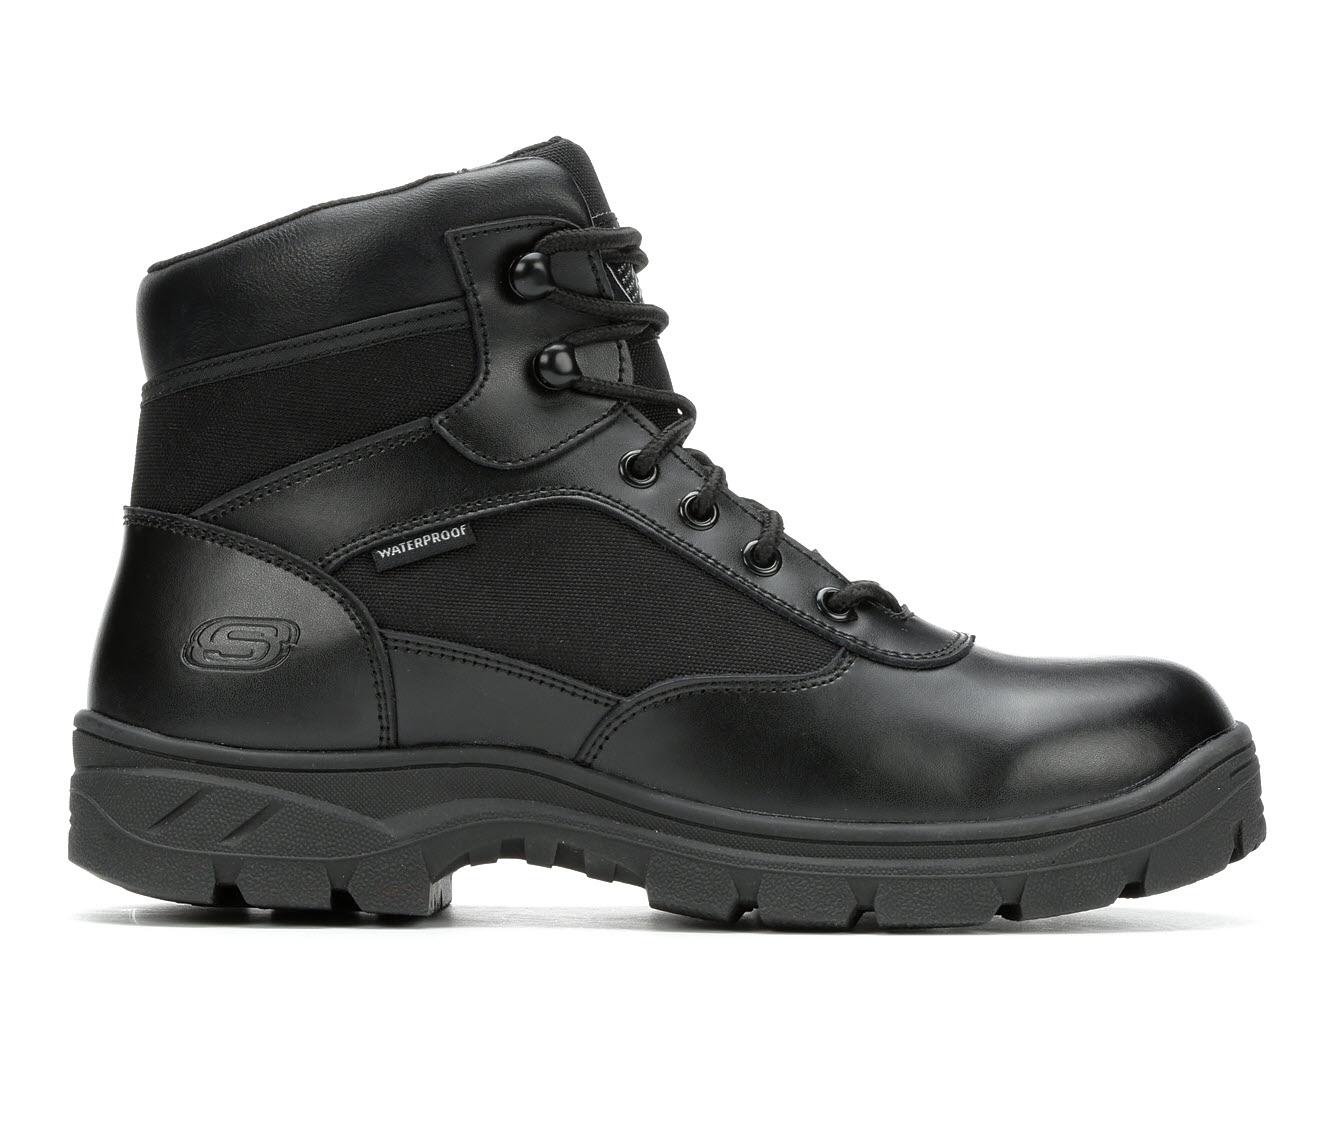 Skechers Work Benen Electrical Hazard Waterproof 77526 Men's Boots (Black Faux Leather)